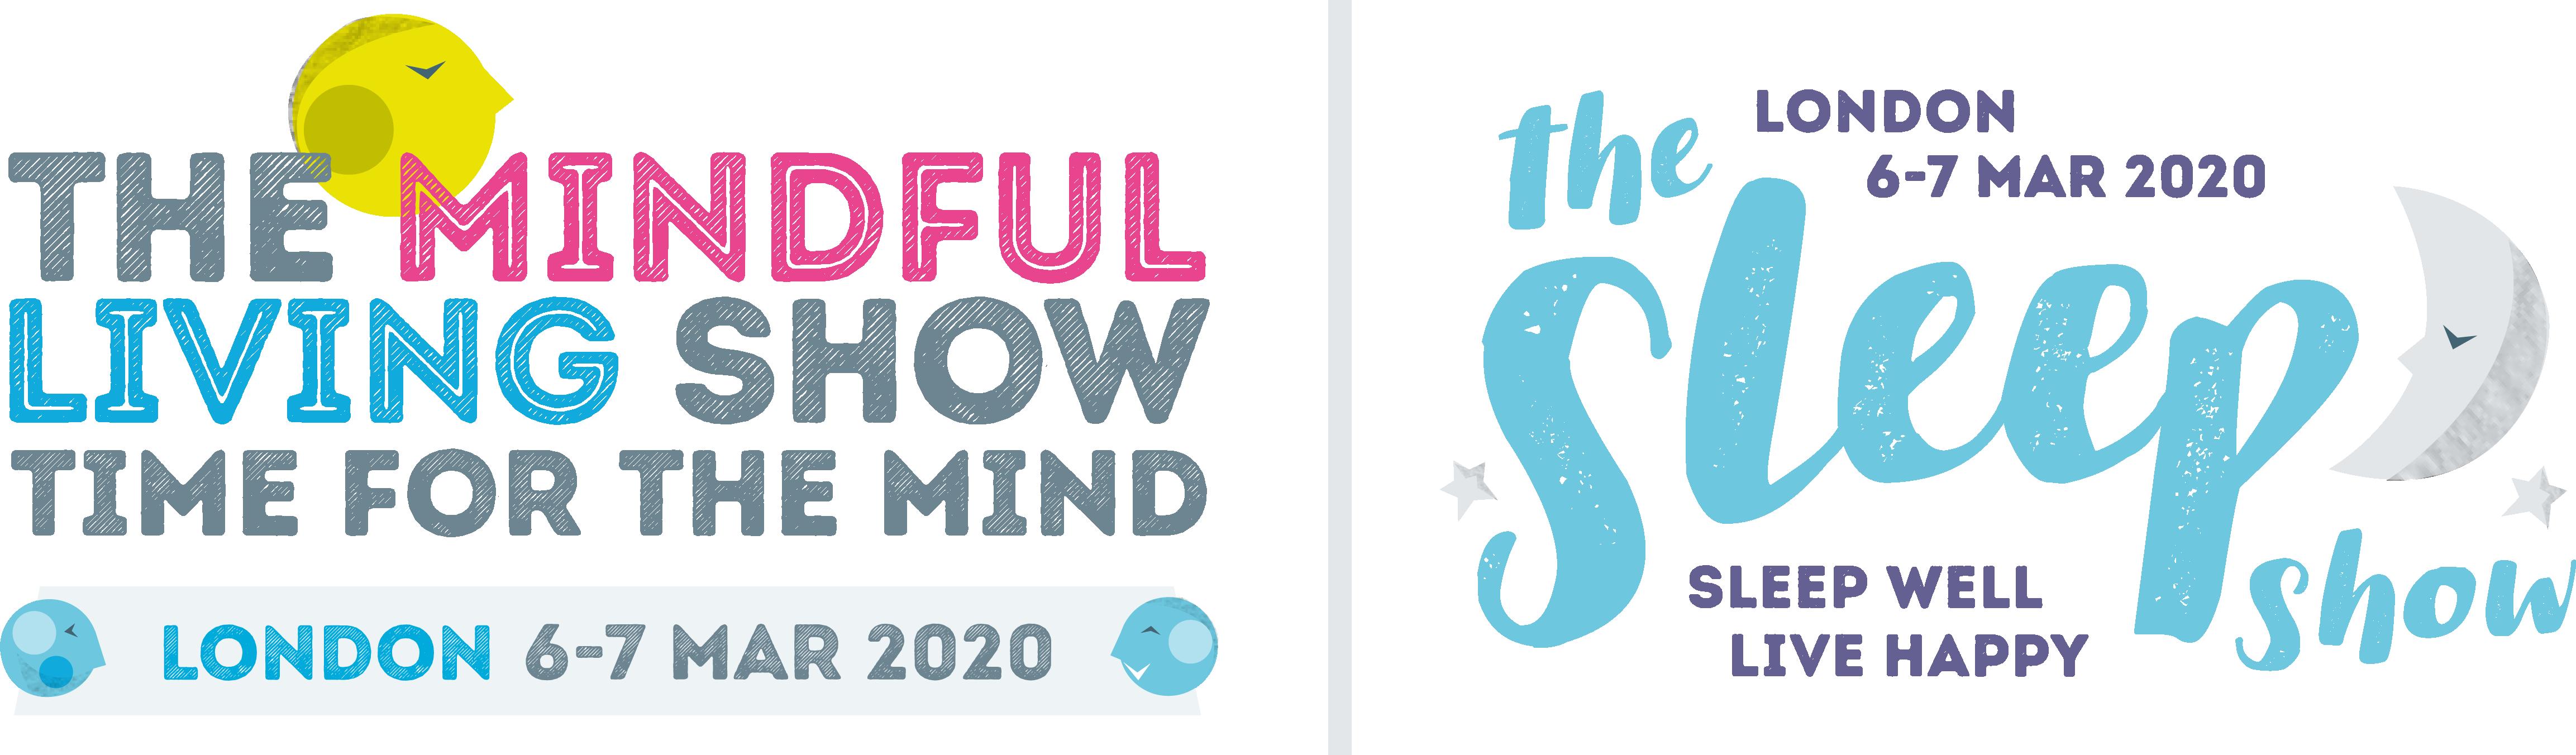 The Mindful Living Show & Sleep Show